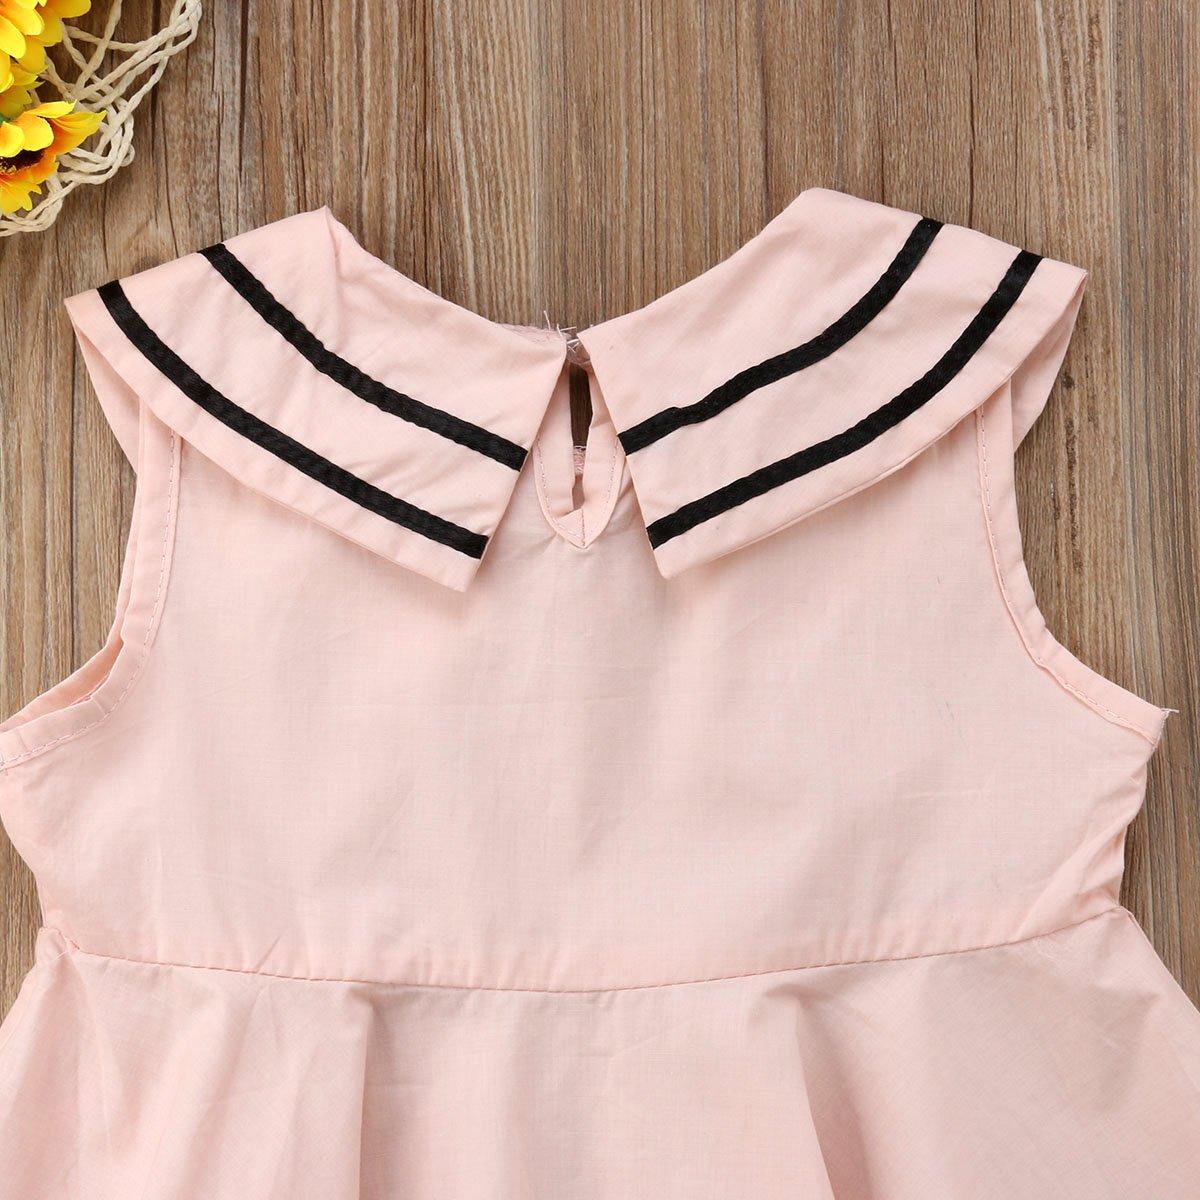 Mubineo Toddler Kids Baby Girl Summer Sleeveless Lapel Preppy Style Princess Dress